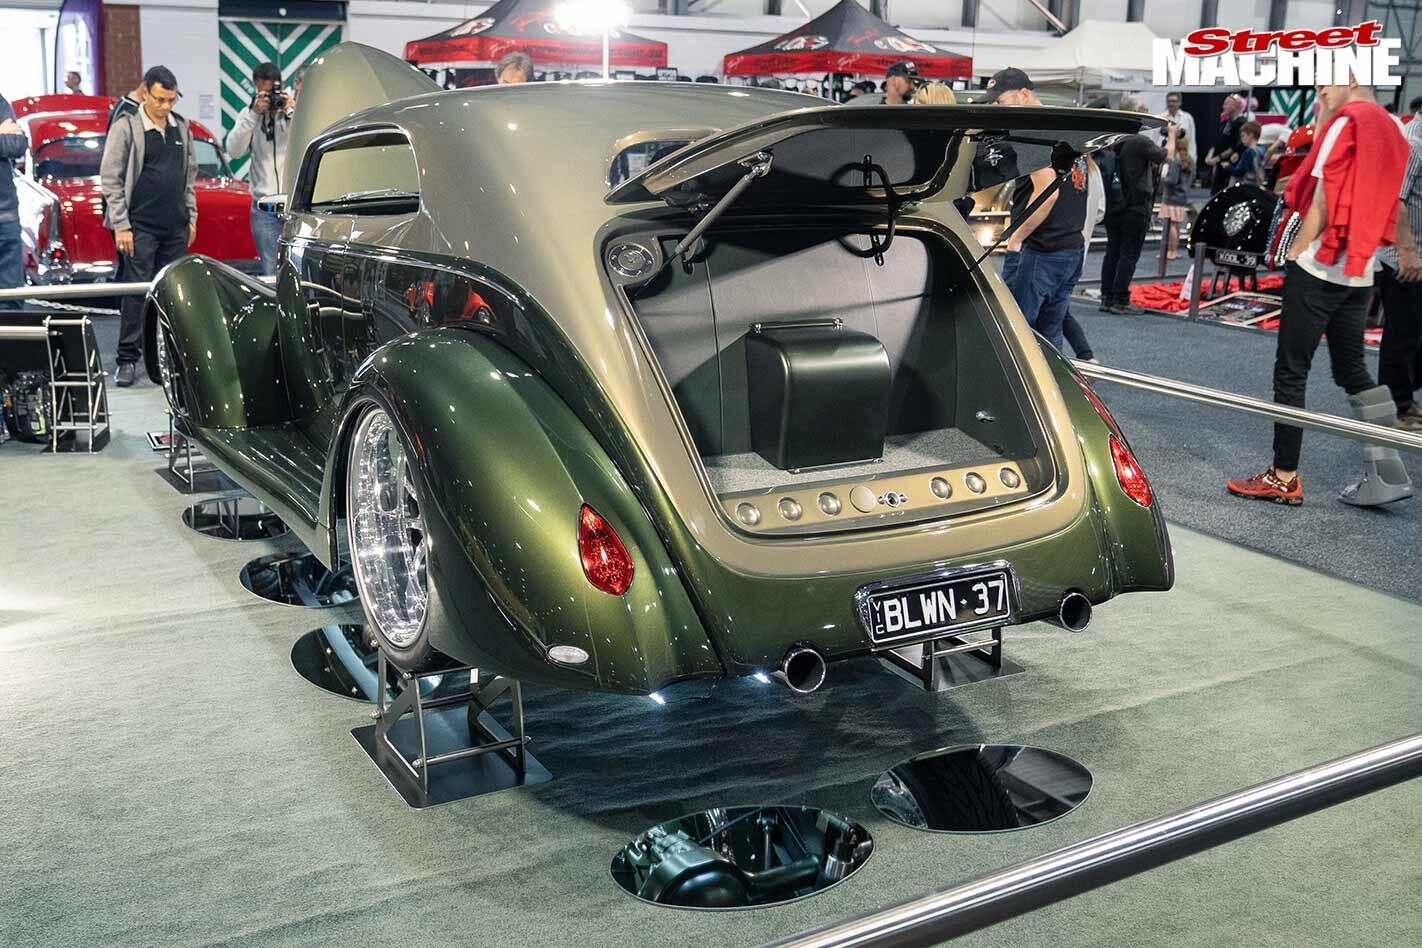 Ford Slamback rear